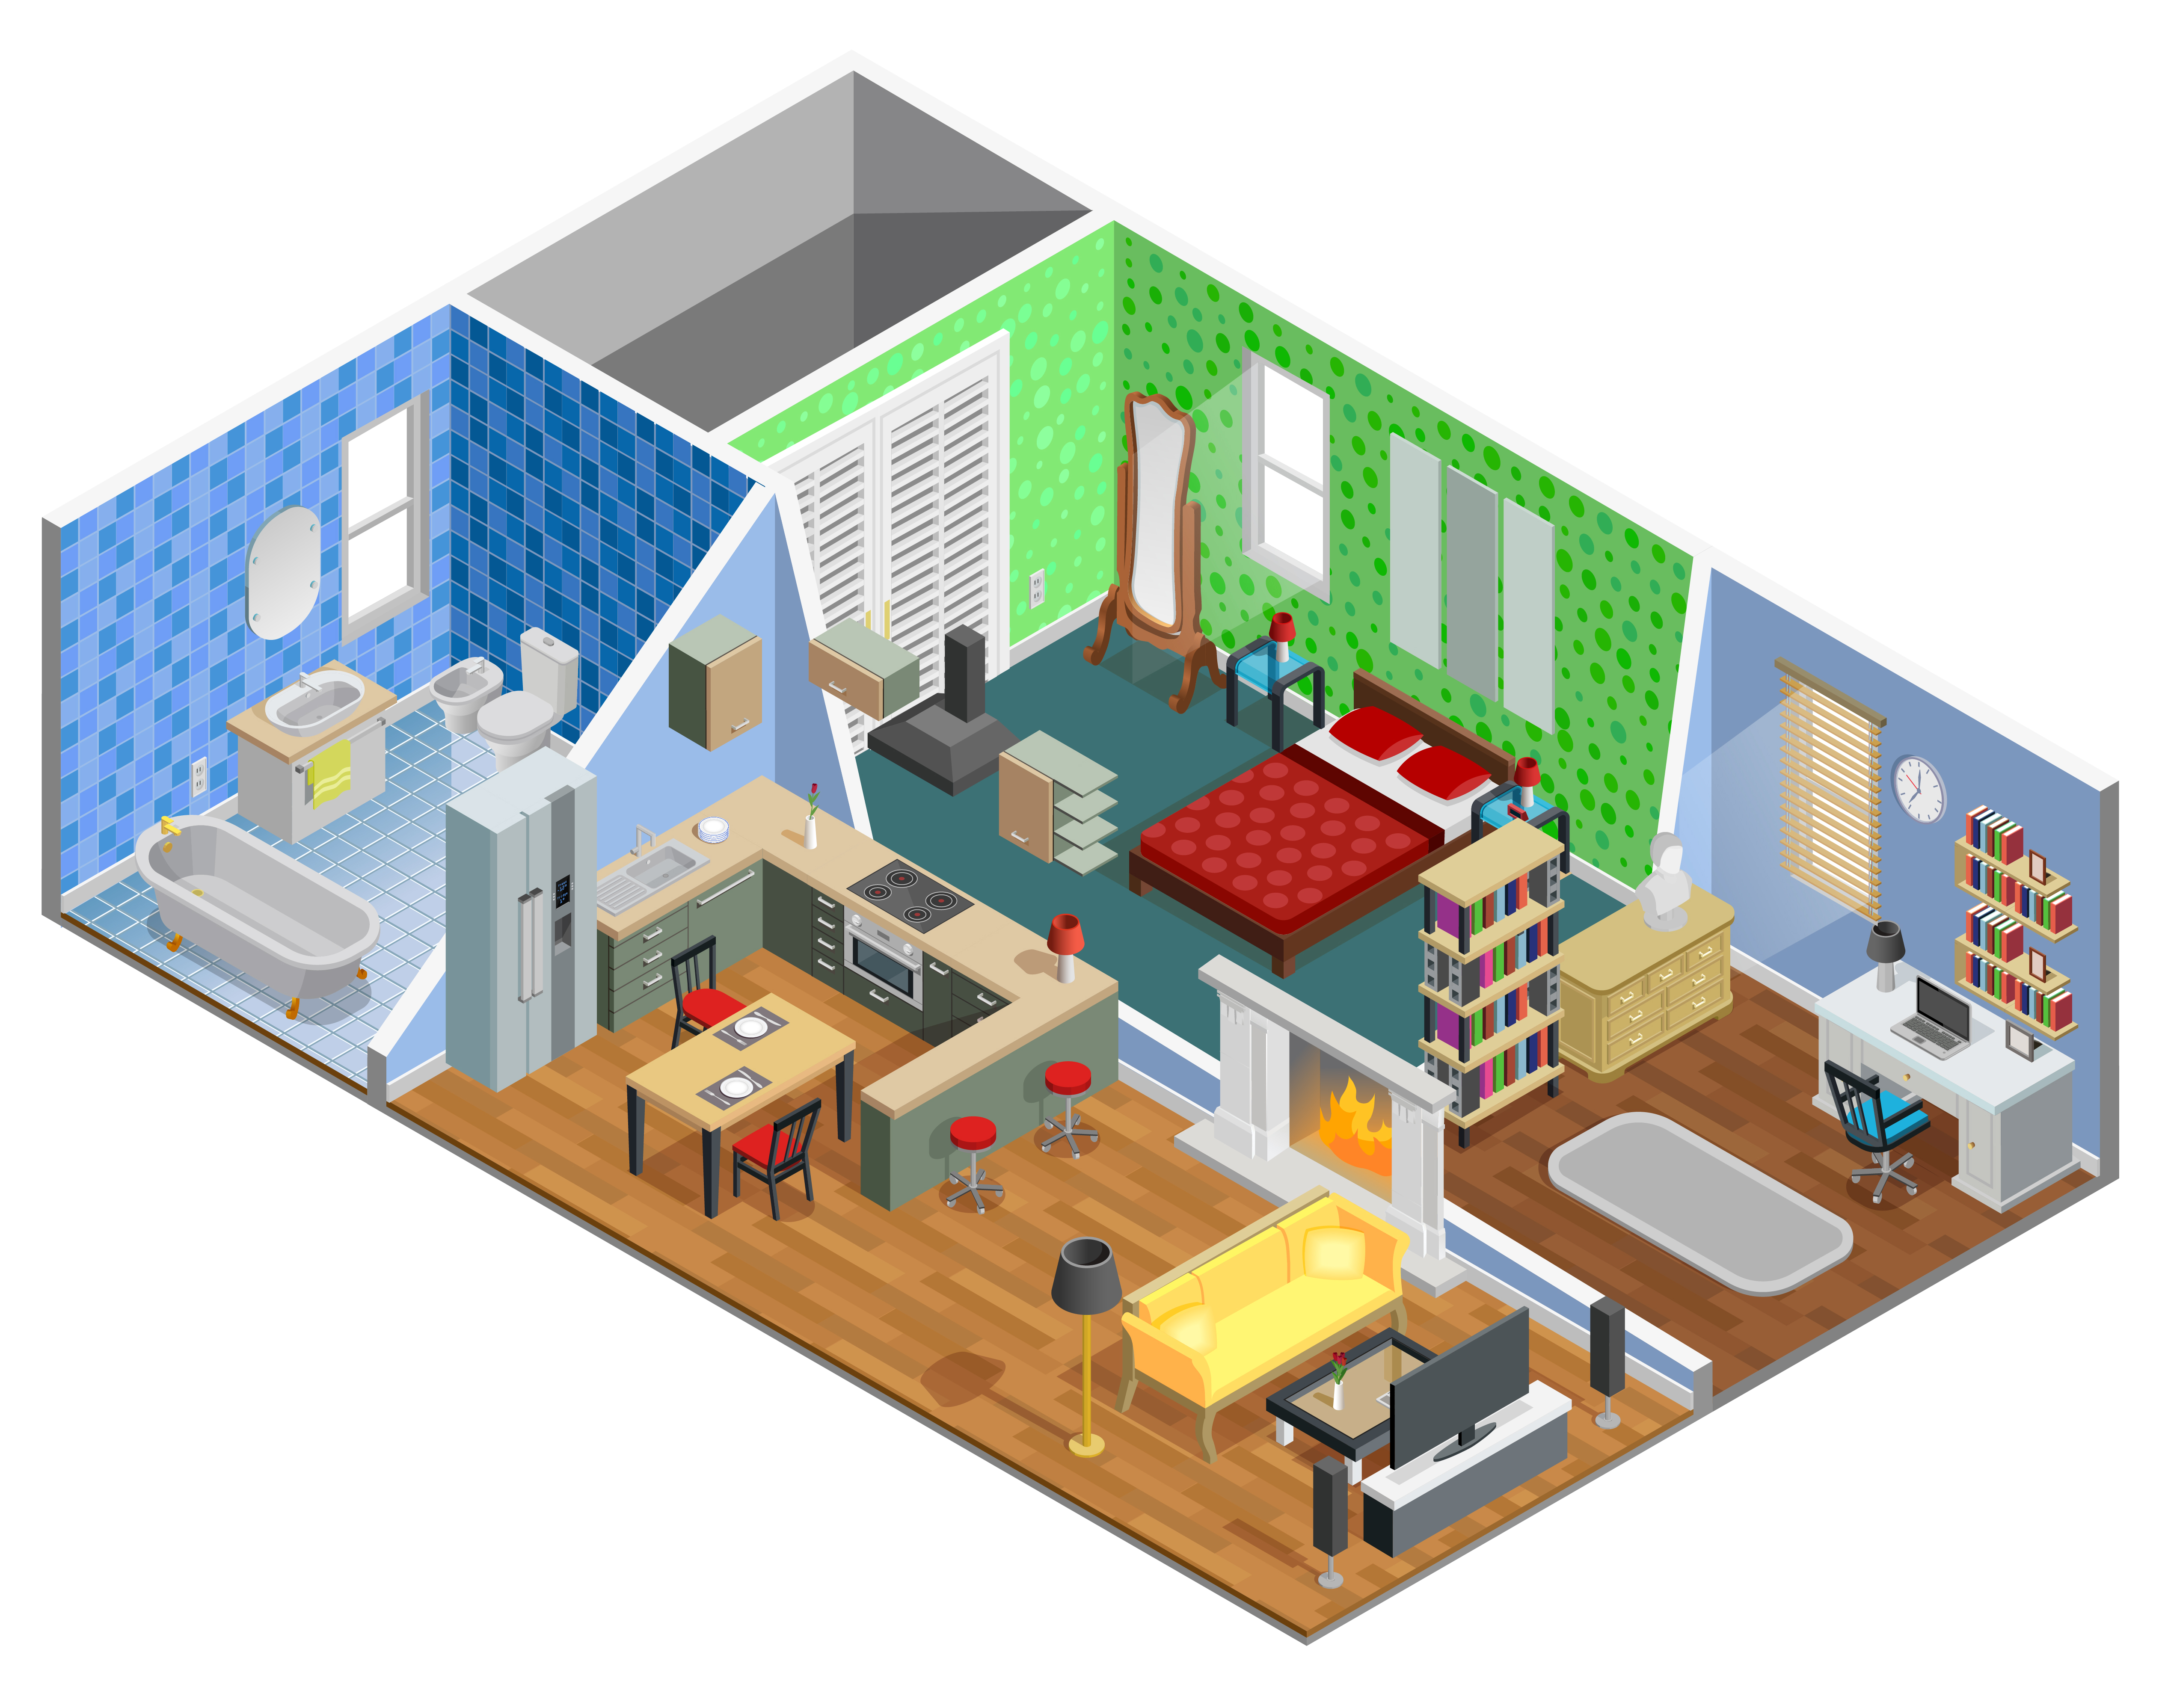 House Interior Design - Download Free Vectors, Clipart ...